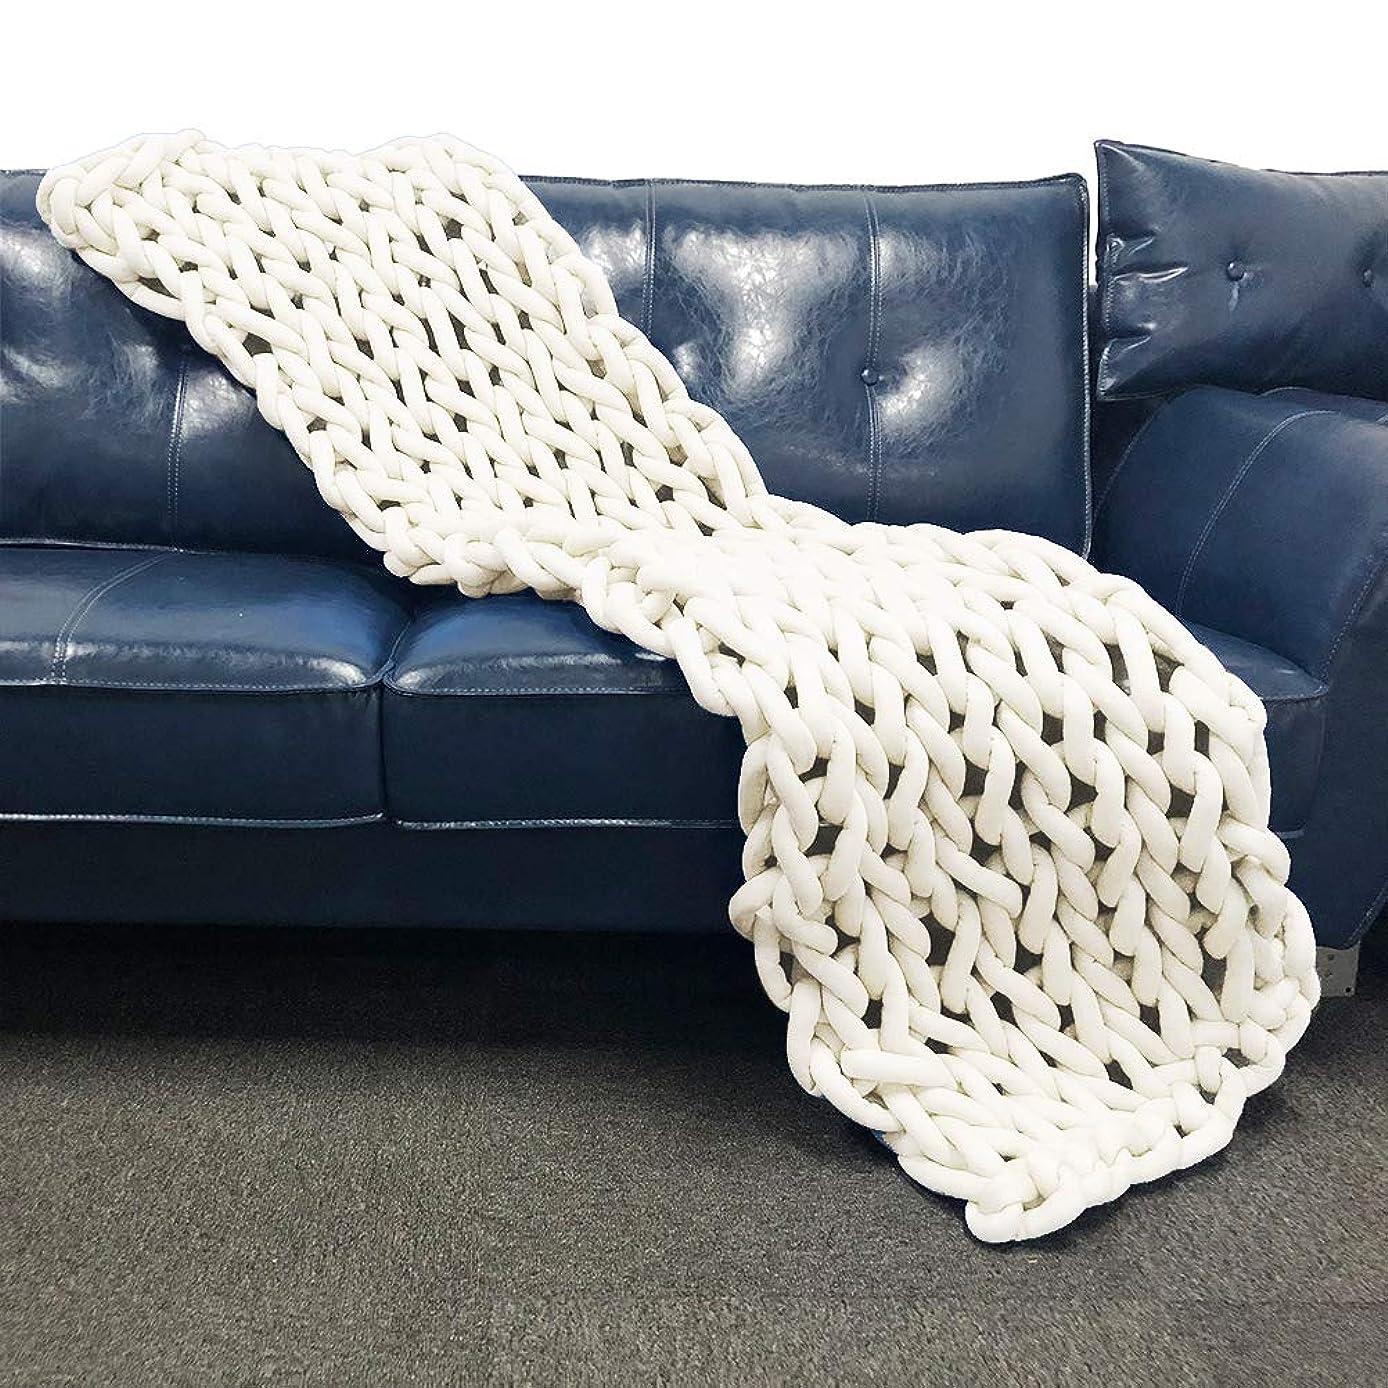 OSVINO ベッドライナー ベッドスロー 手編み 柔らかな肌触り 北欧風 年中通用 旅館 民泊 洗える 客間 自宅 インテリア 飾り, クリーム 50×180cm シングル